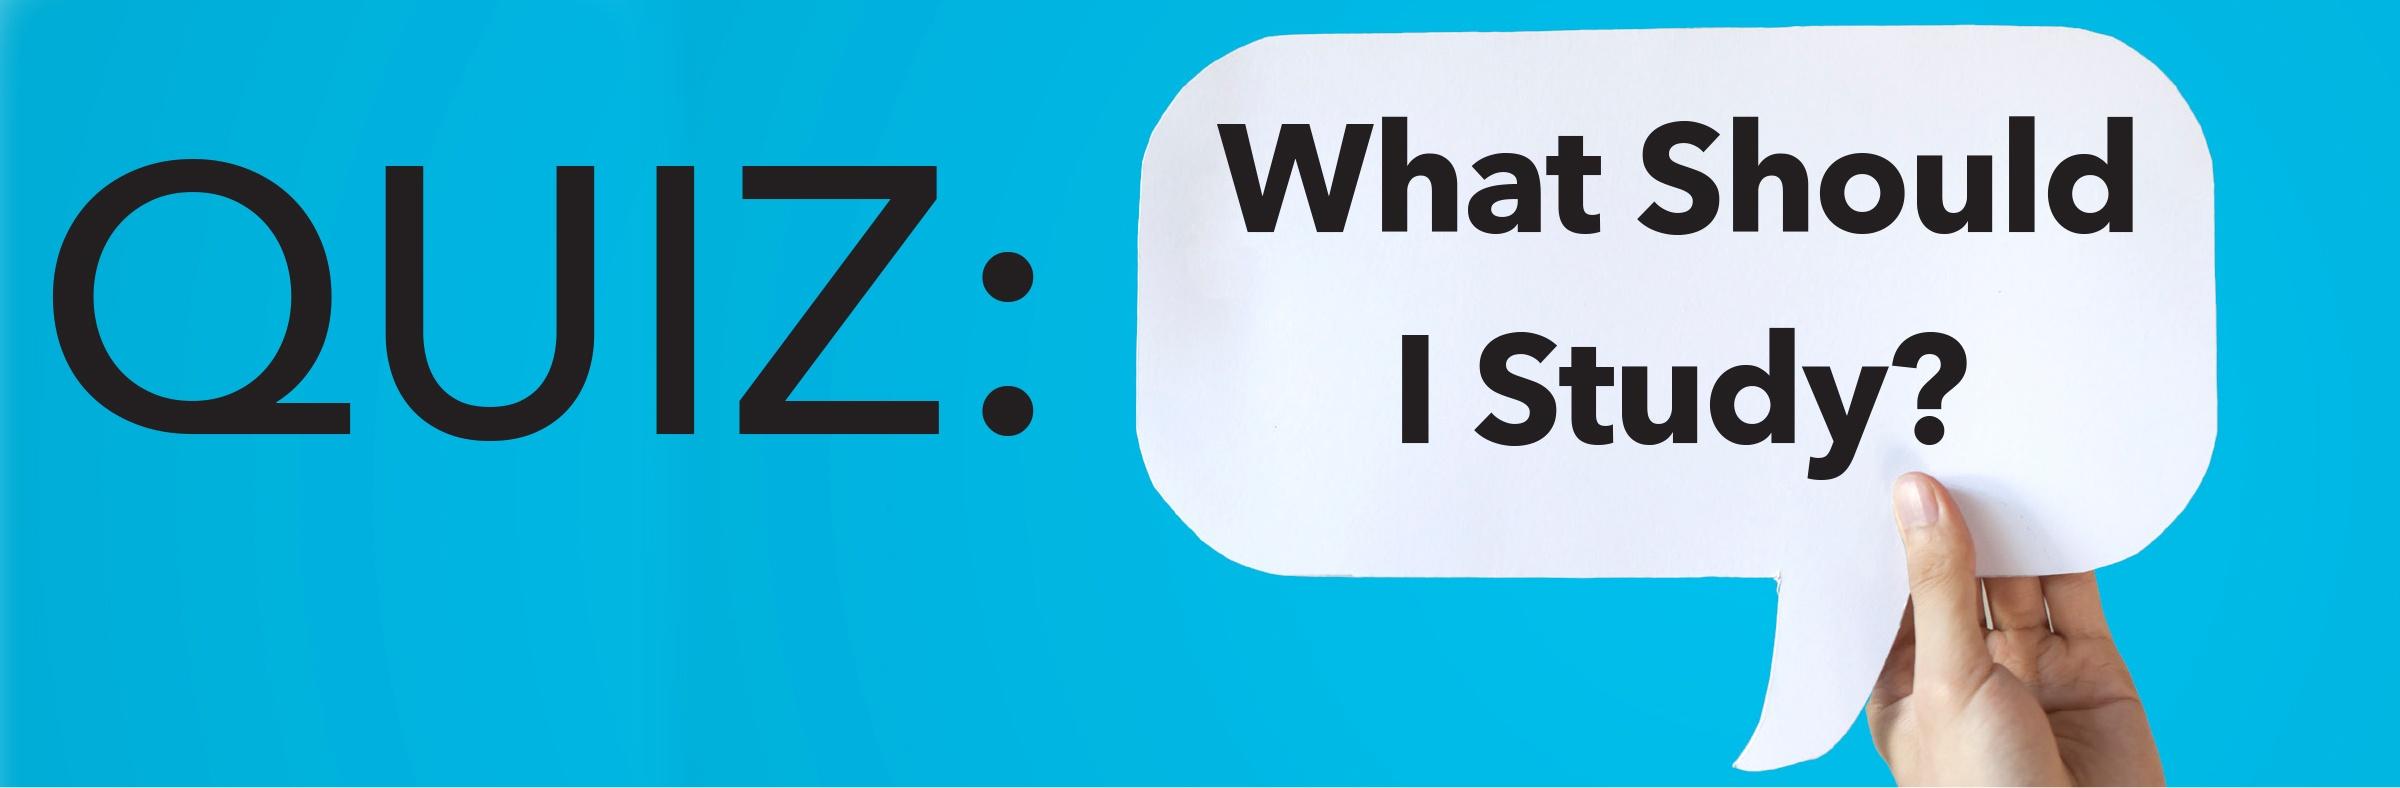 what should i study banner.jpg